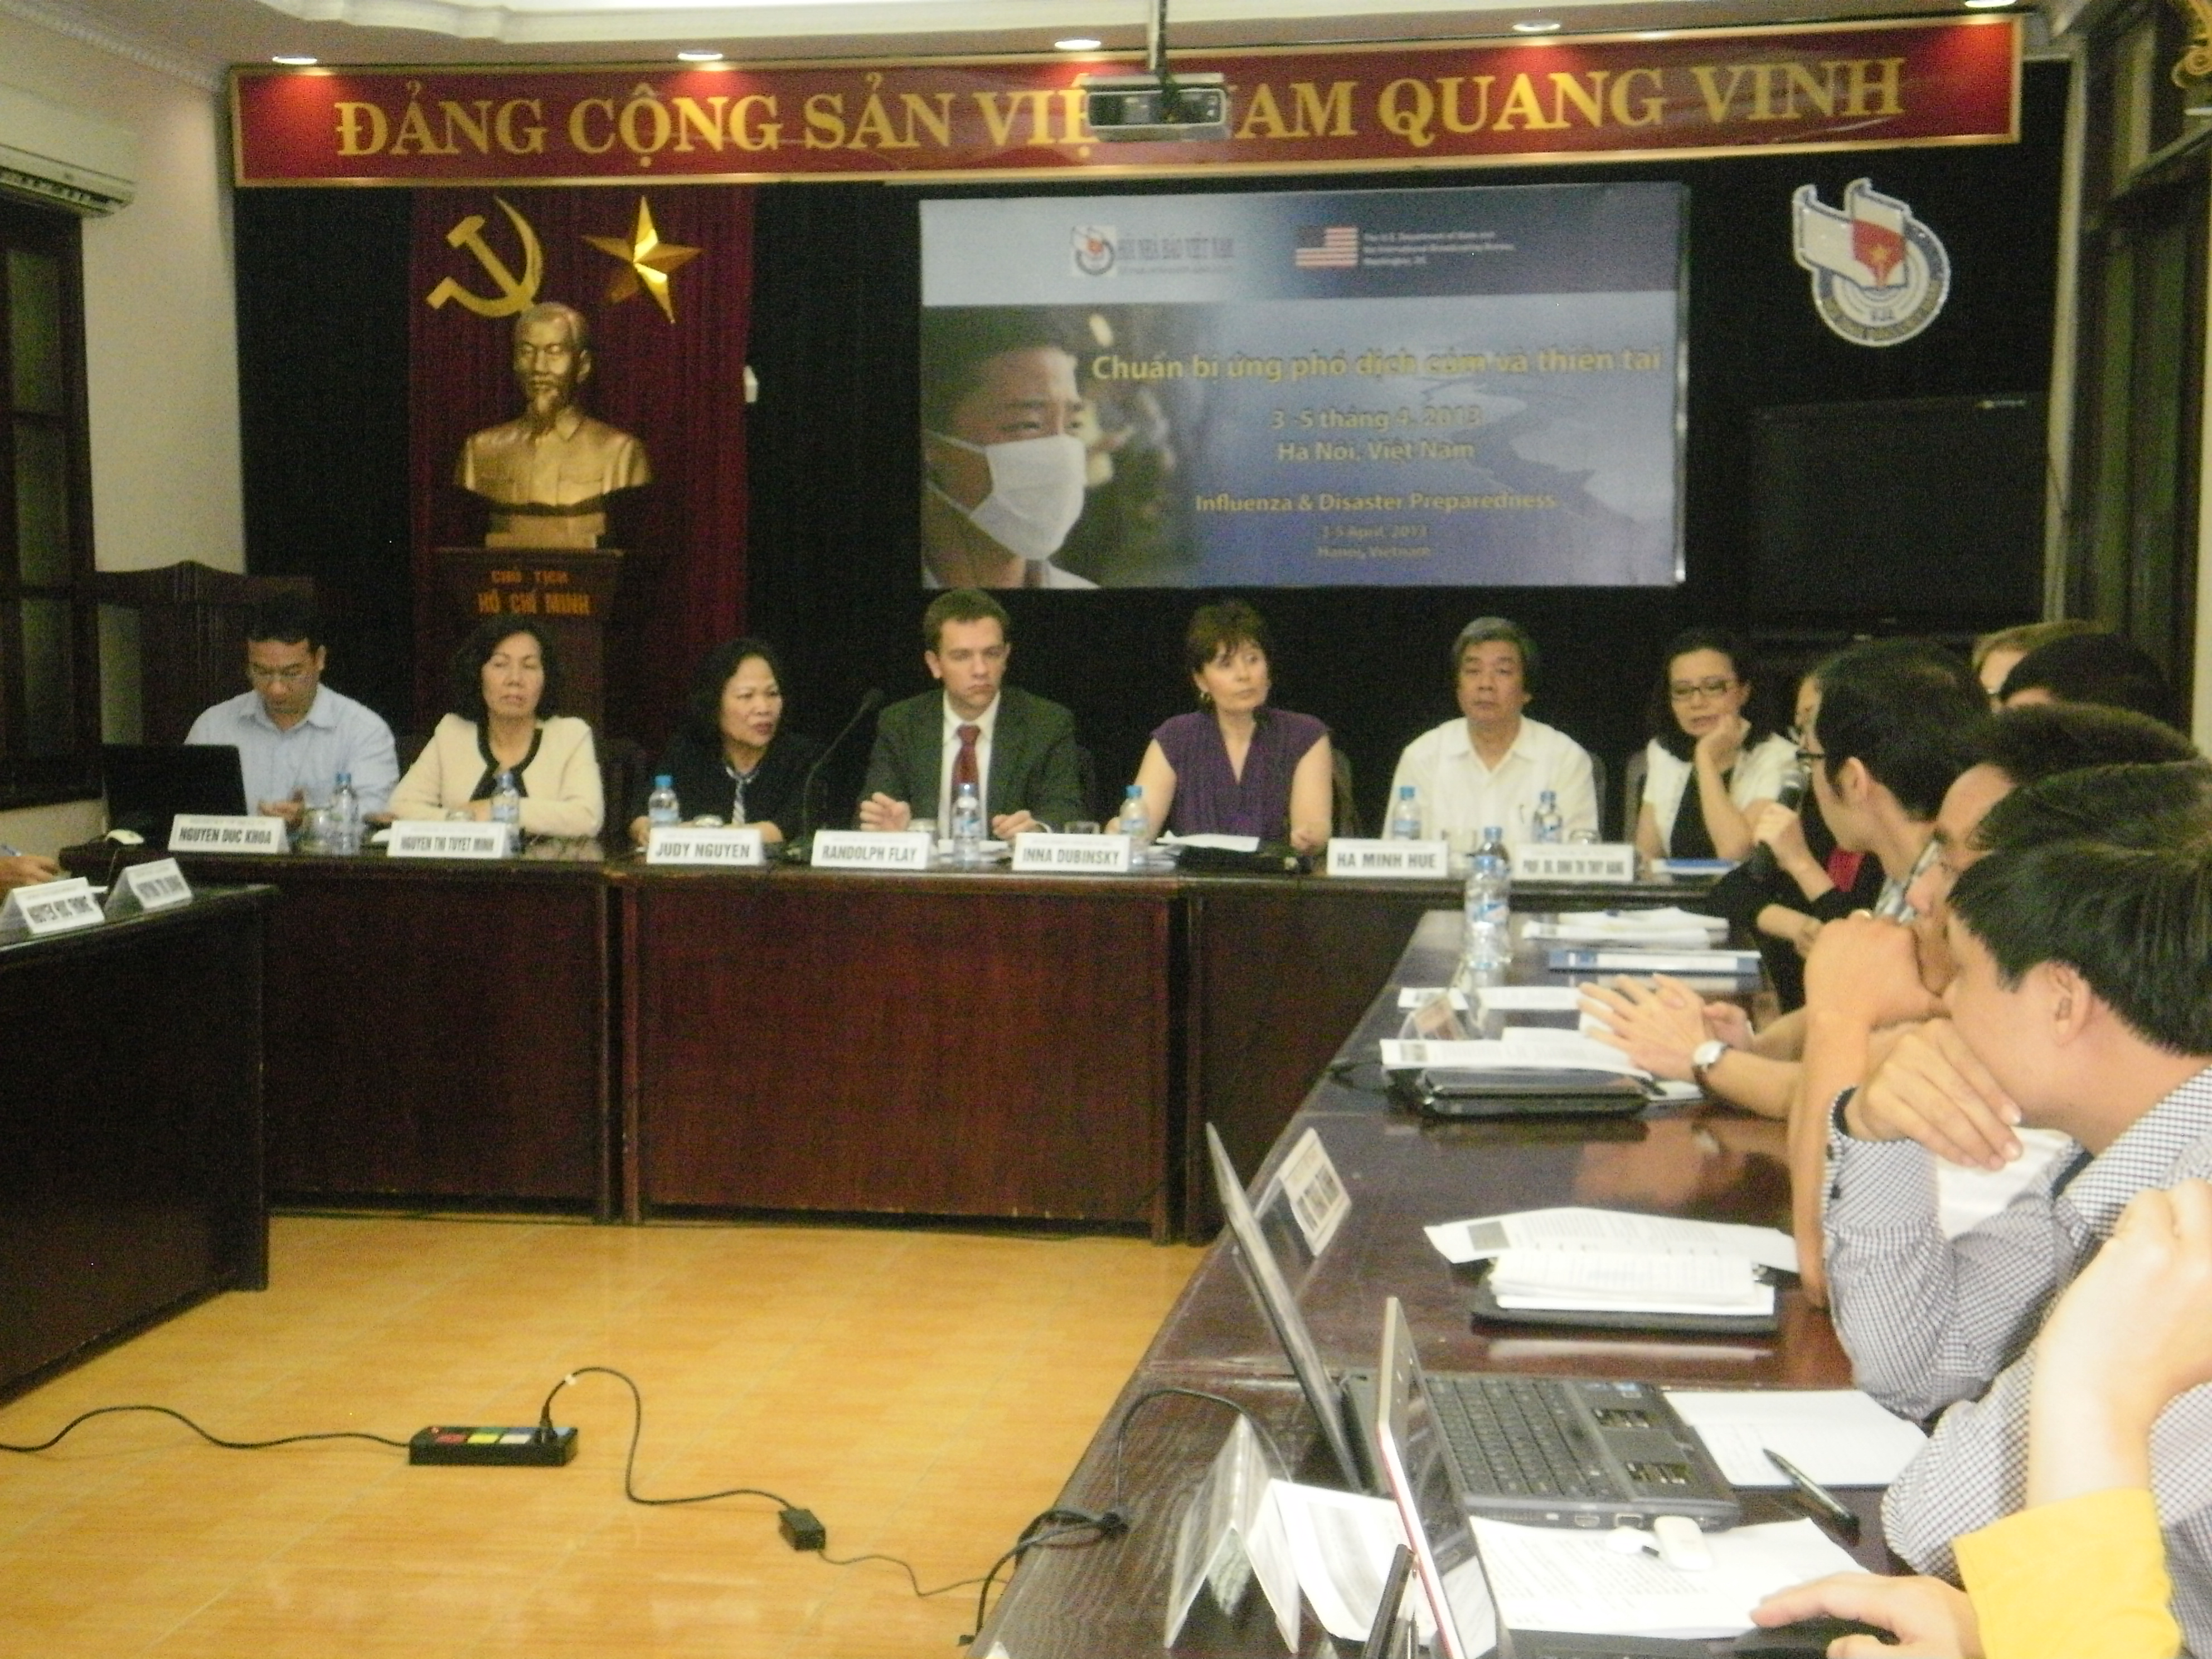 BBG provides bird flu reporting workshops